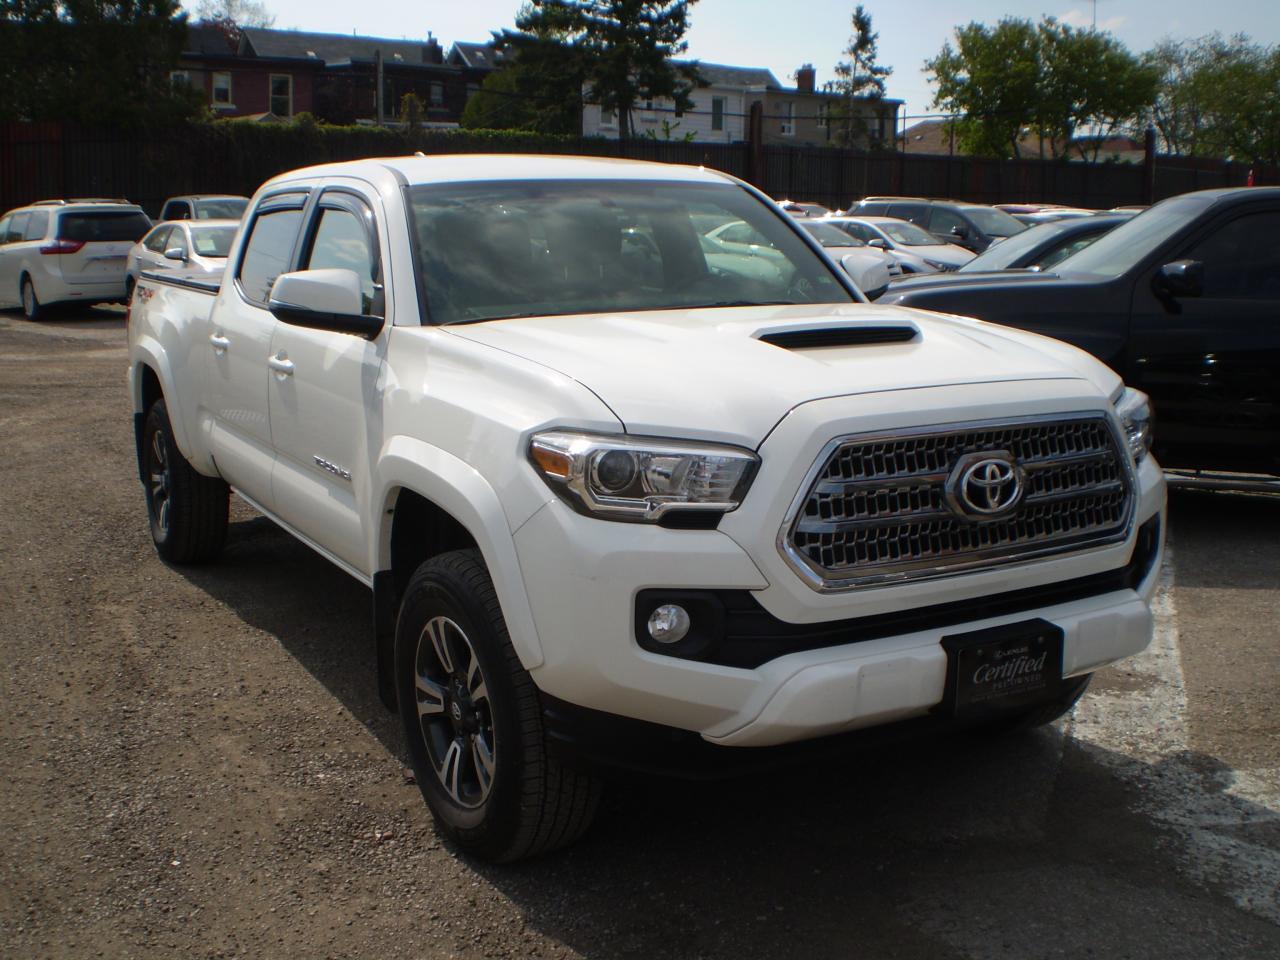 Used 2016 Toyota Tacoma Trd Up Grade Roof Nav Blind Spot